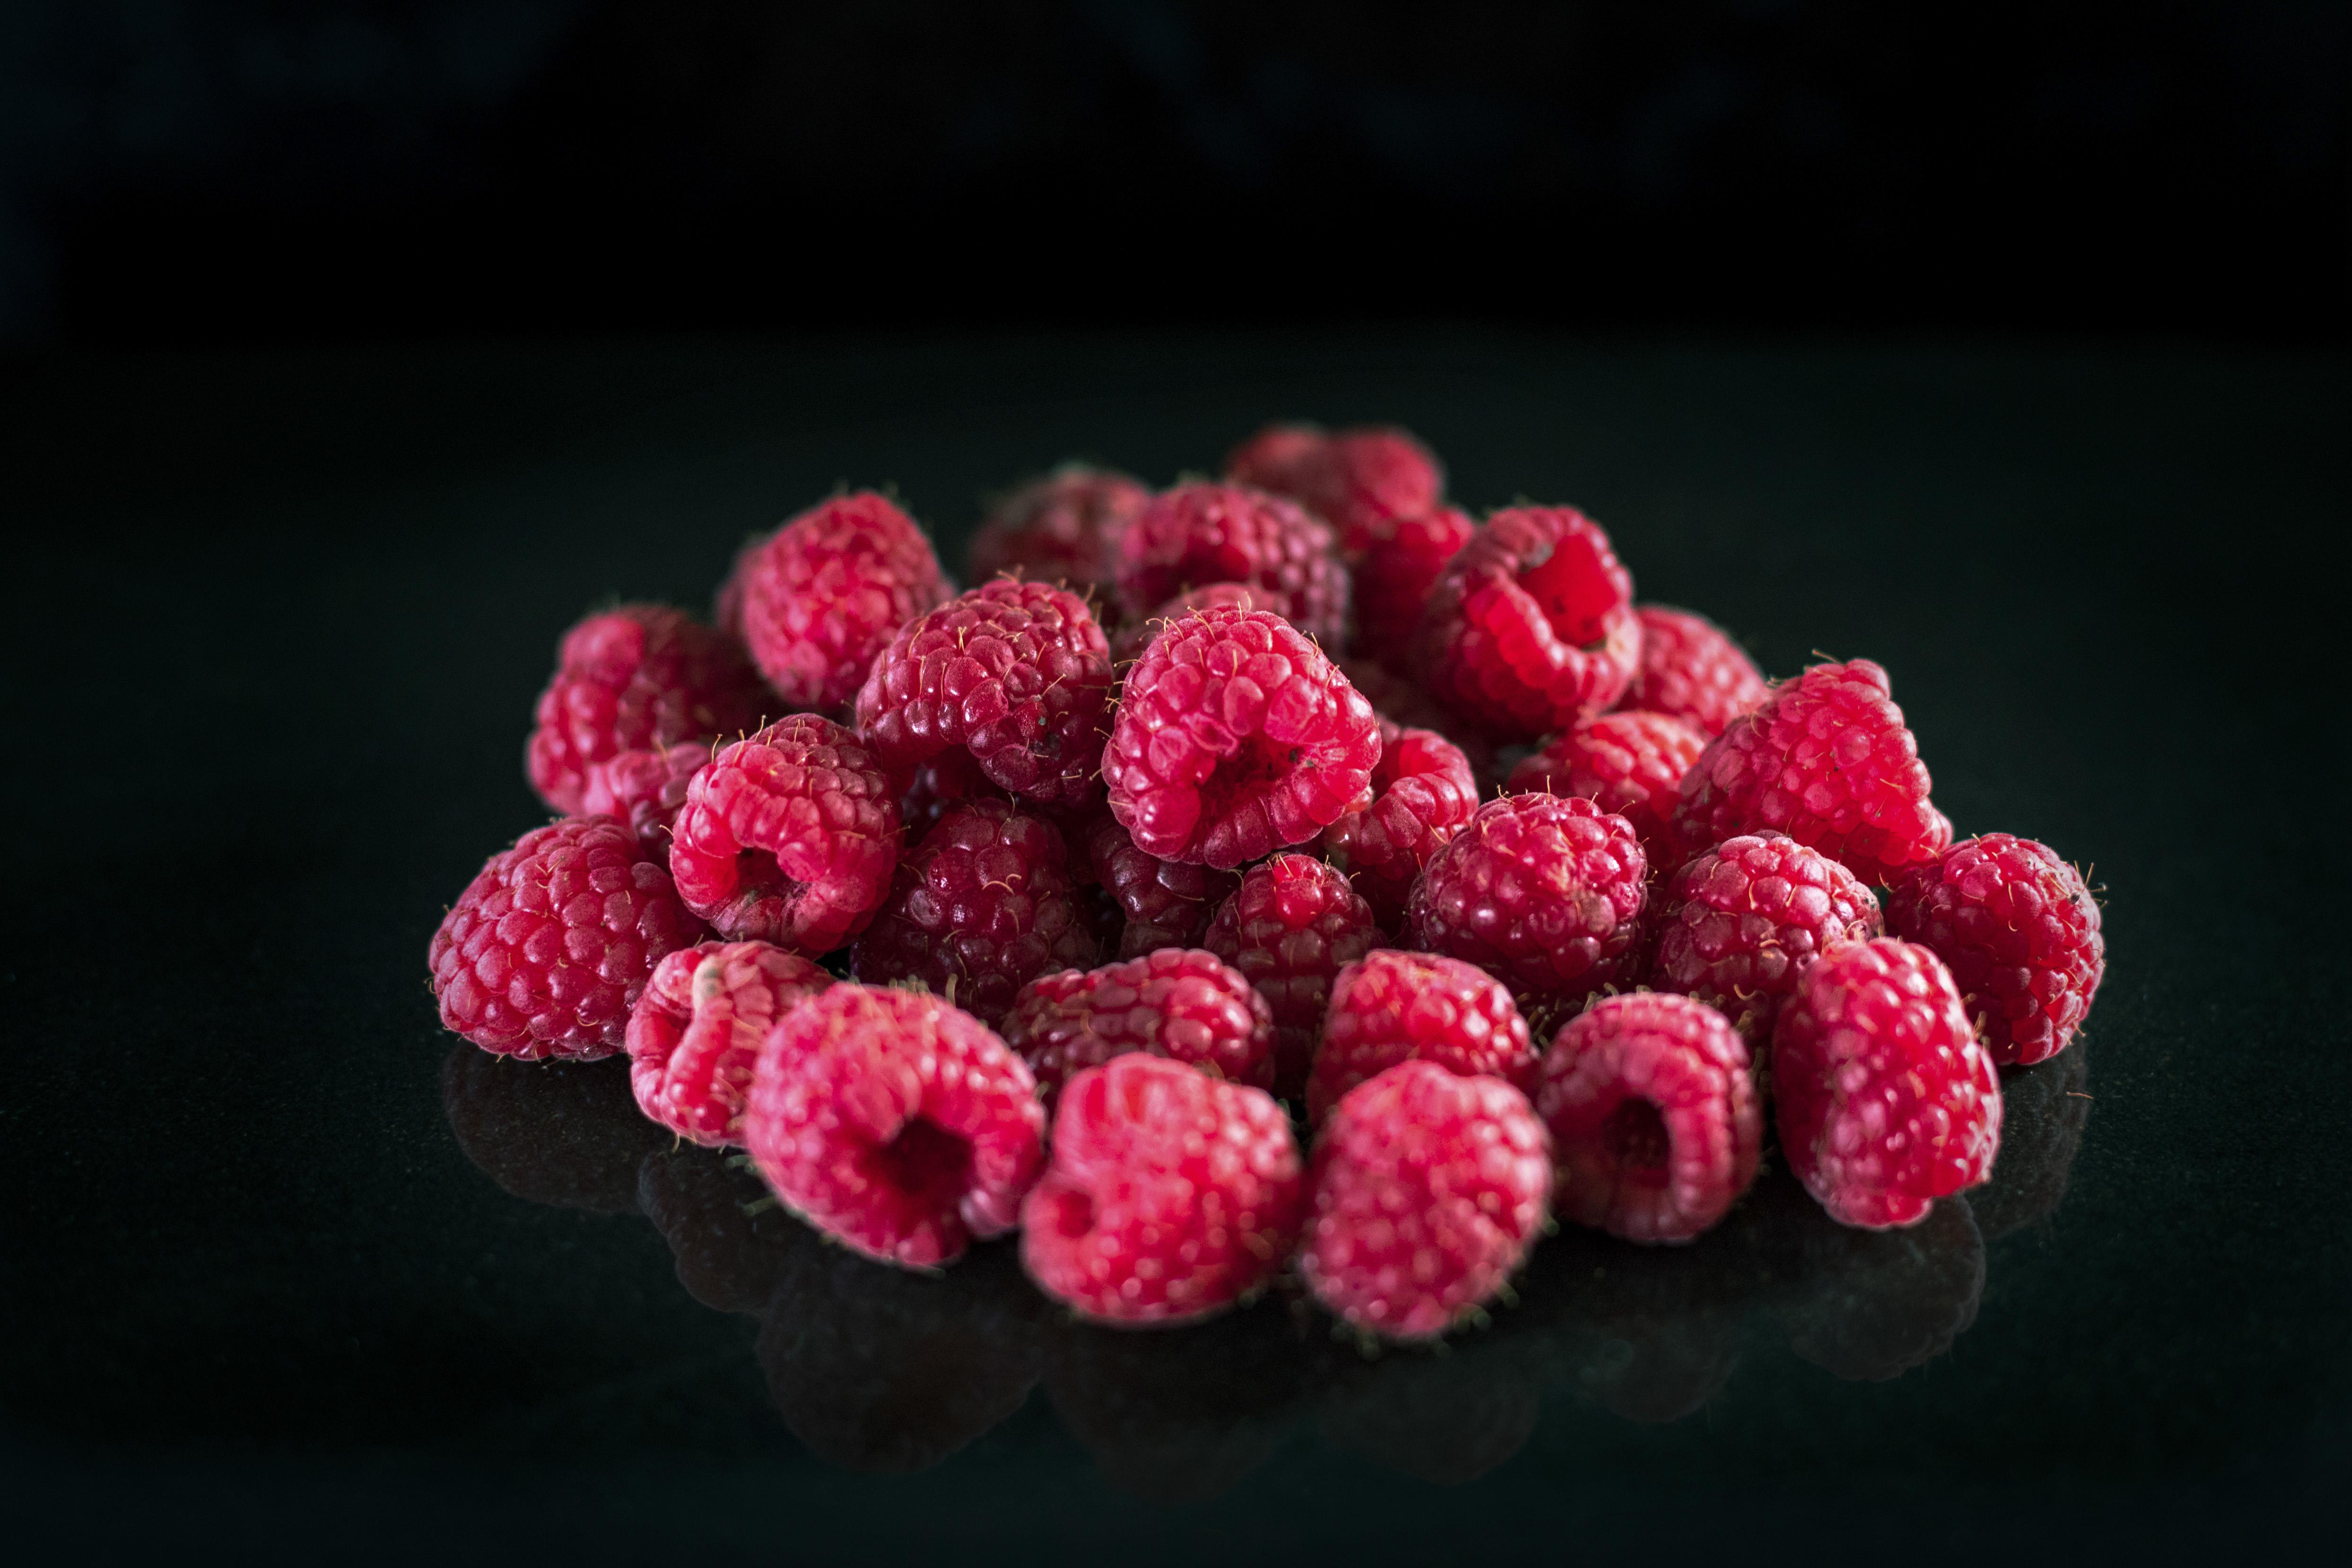 Raspberries against a black background, studio shot